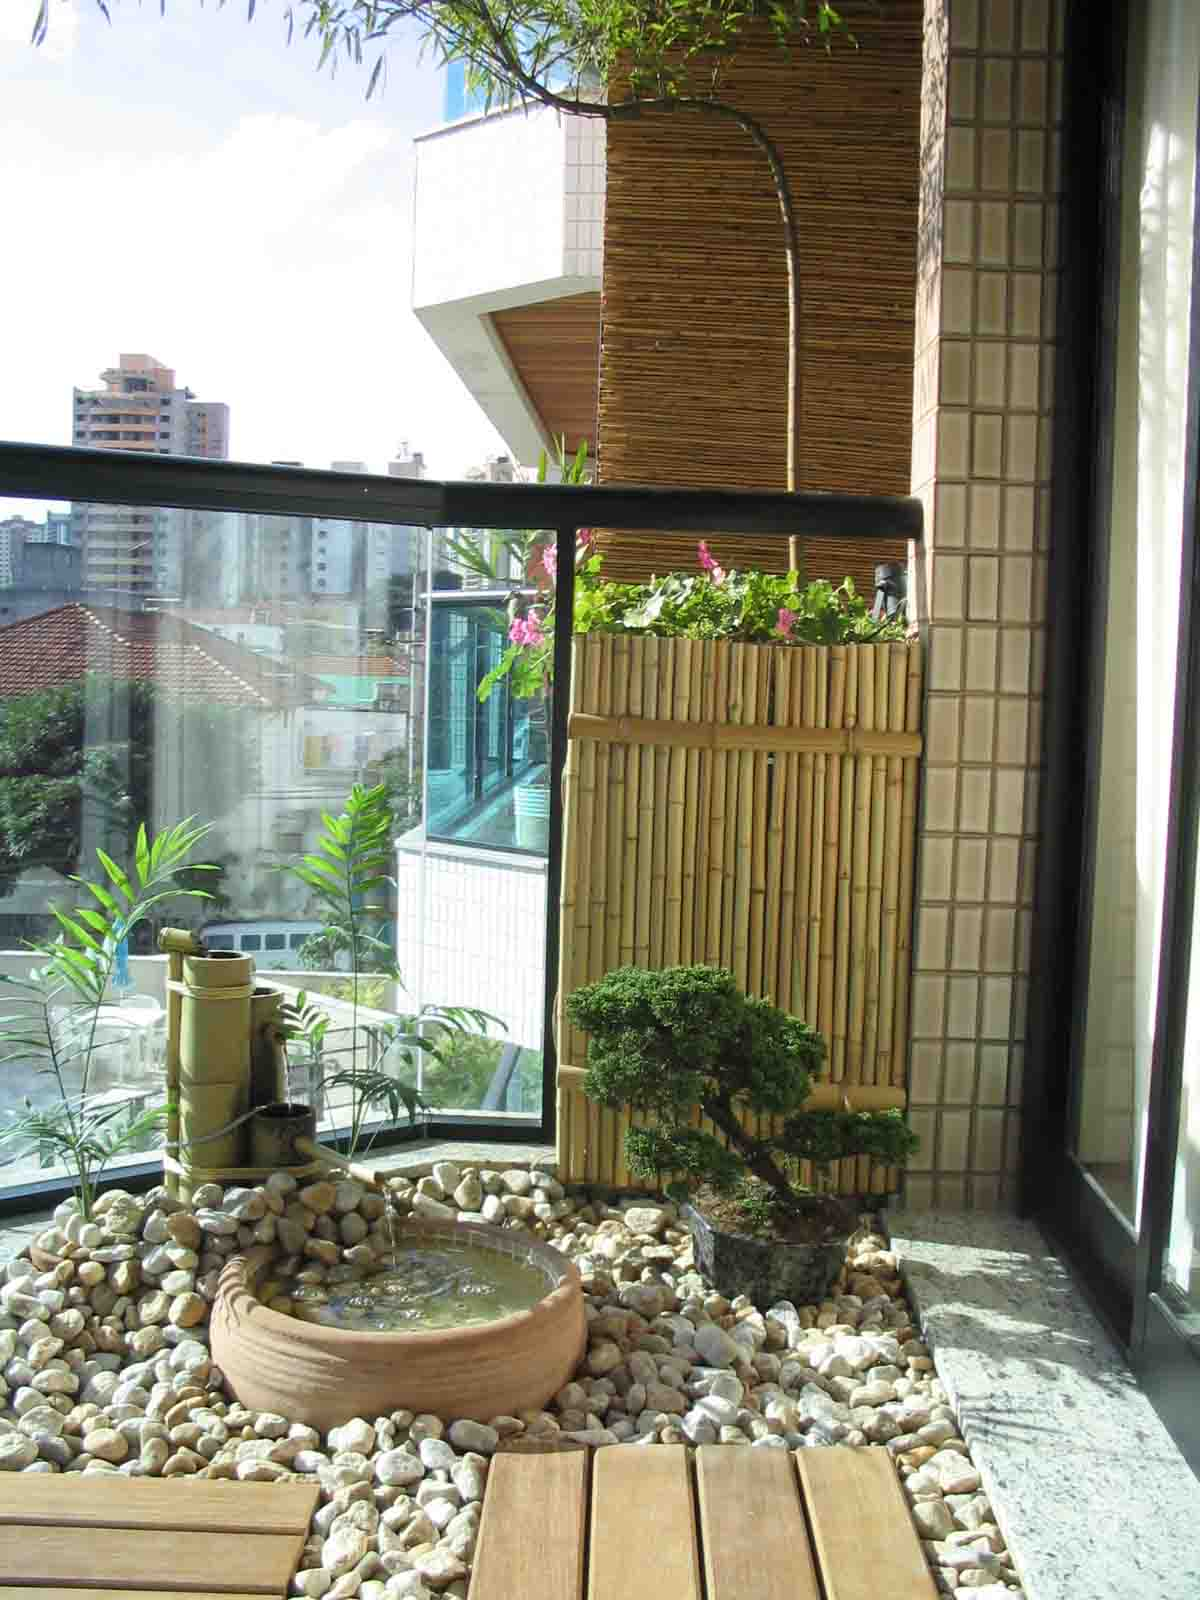 decoracao jardim varanda:Decoracao De Jardins #604828 1200x1600